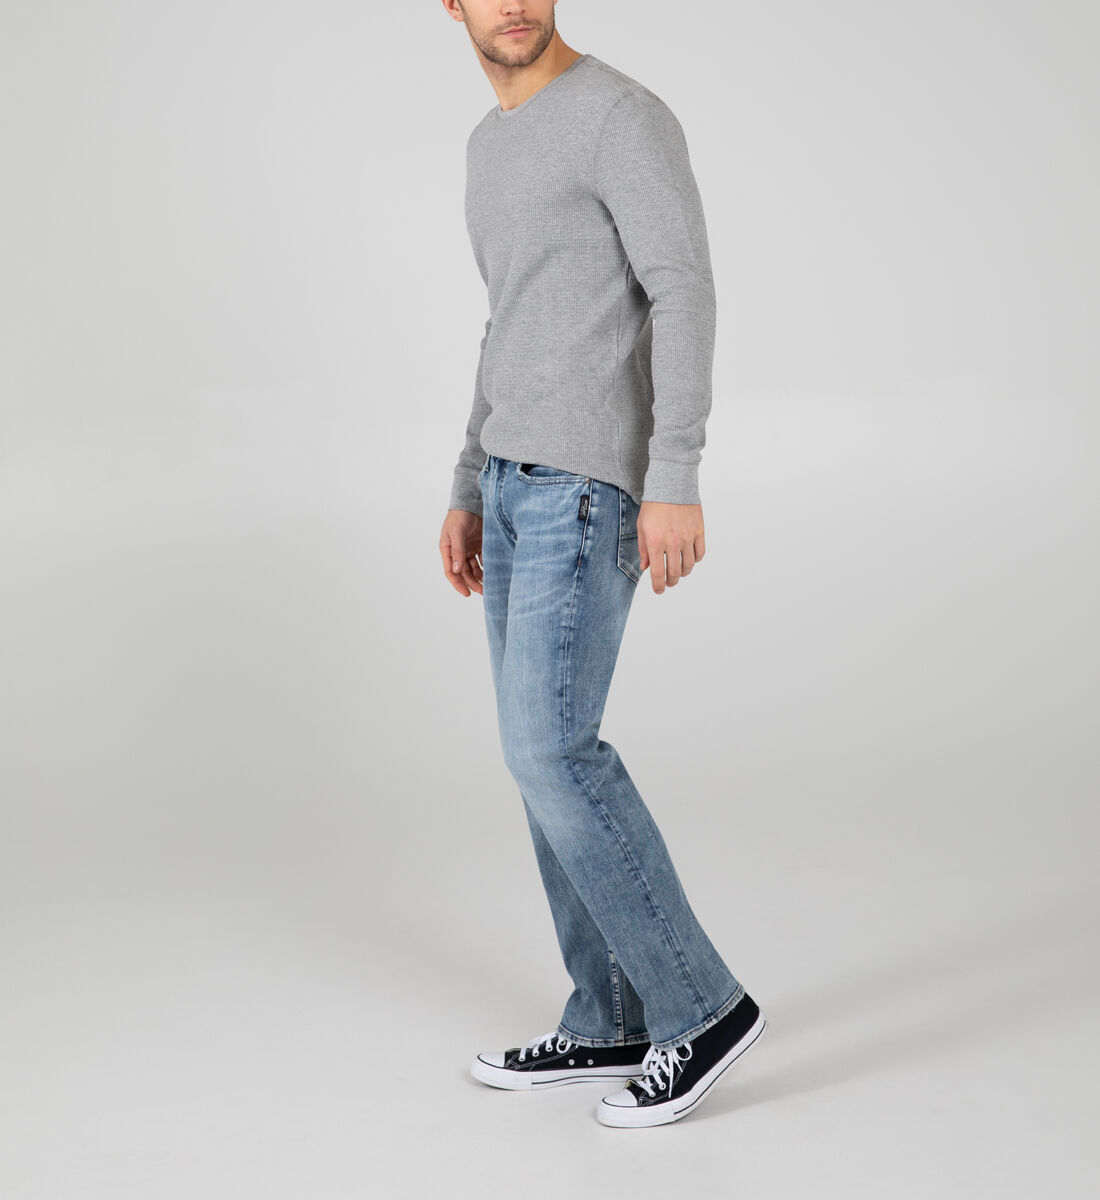 Allan Classic Fit Straight Leg Jeans Side